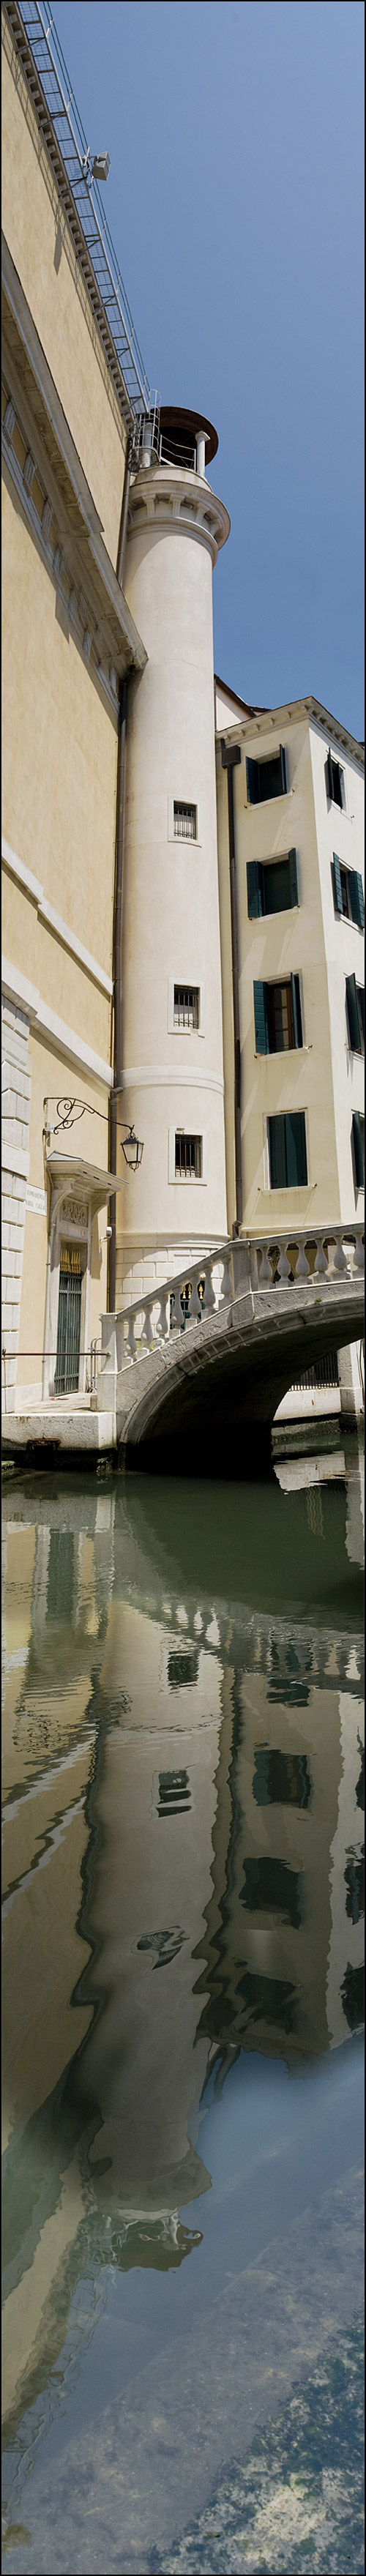 La Fenice - Venice Italy  Silver in Vertival Panoramas 2008